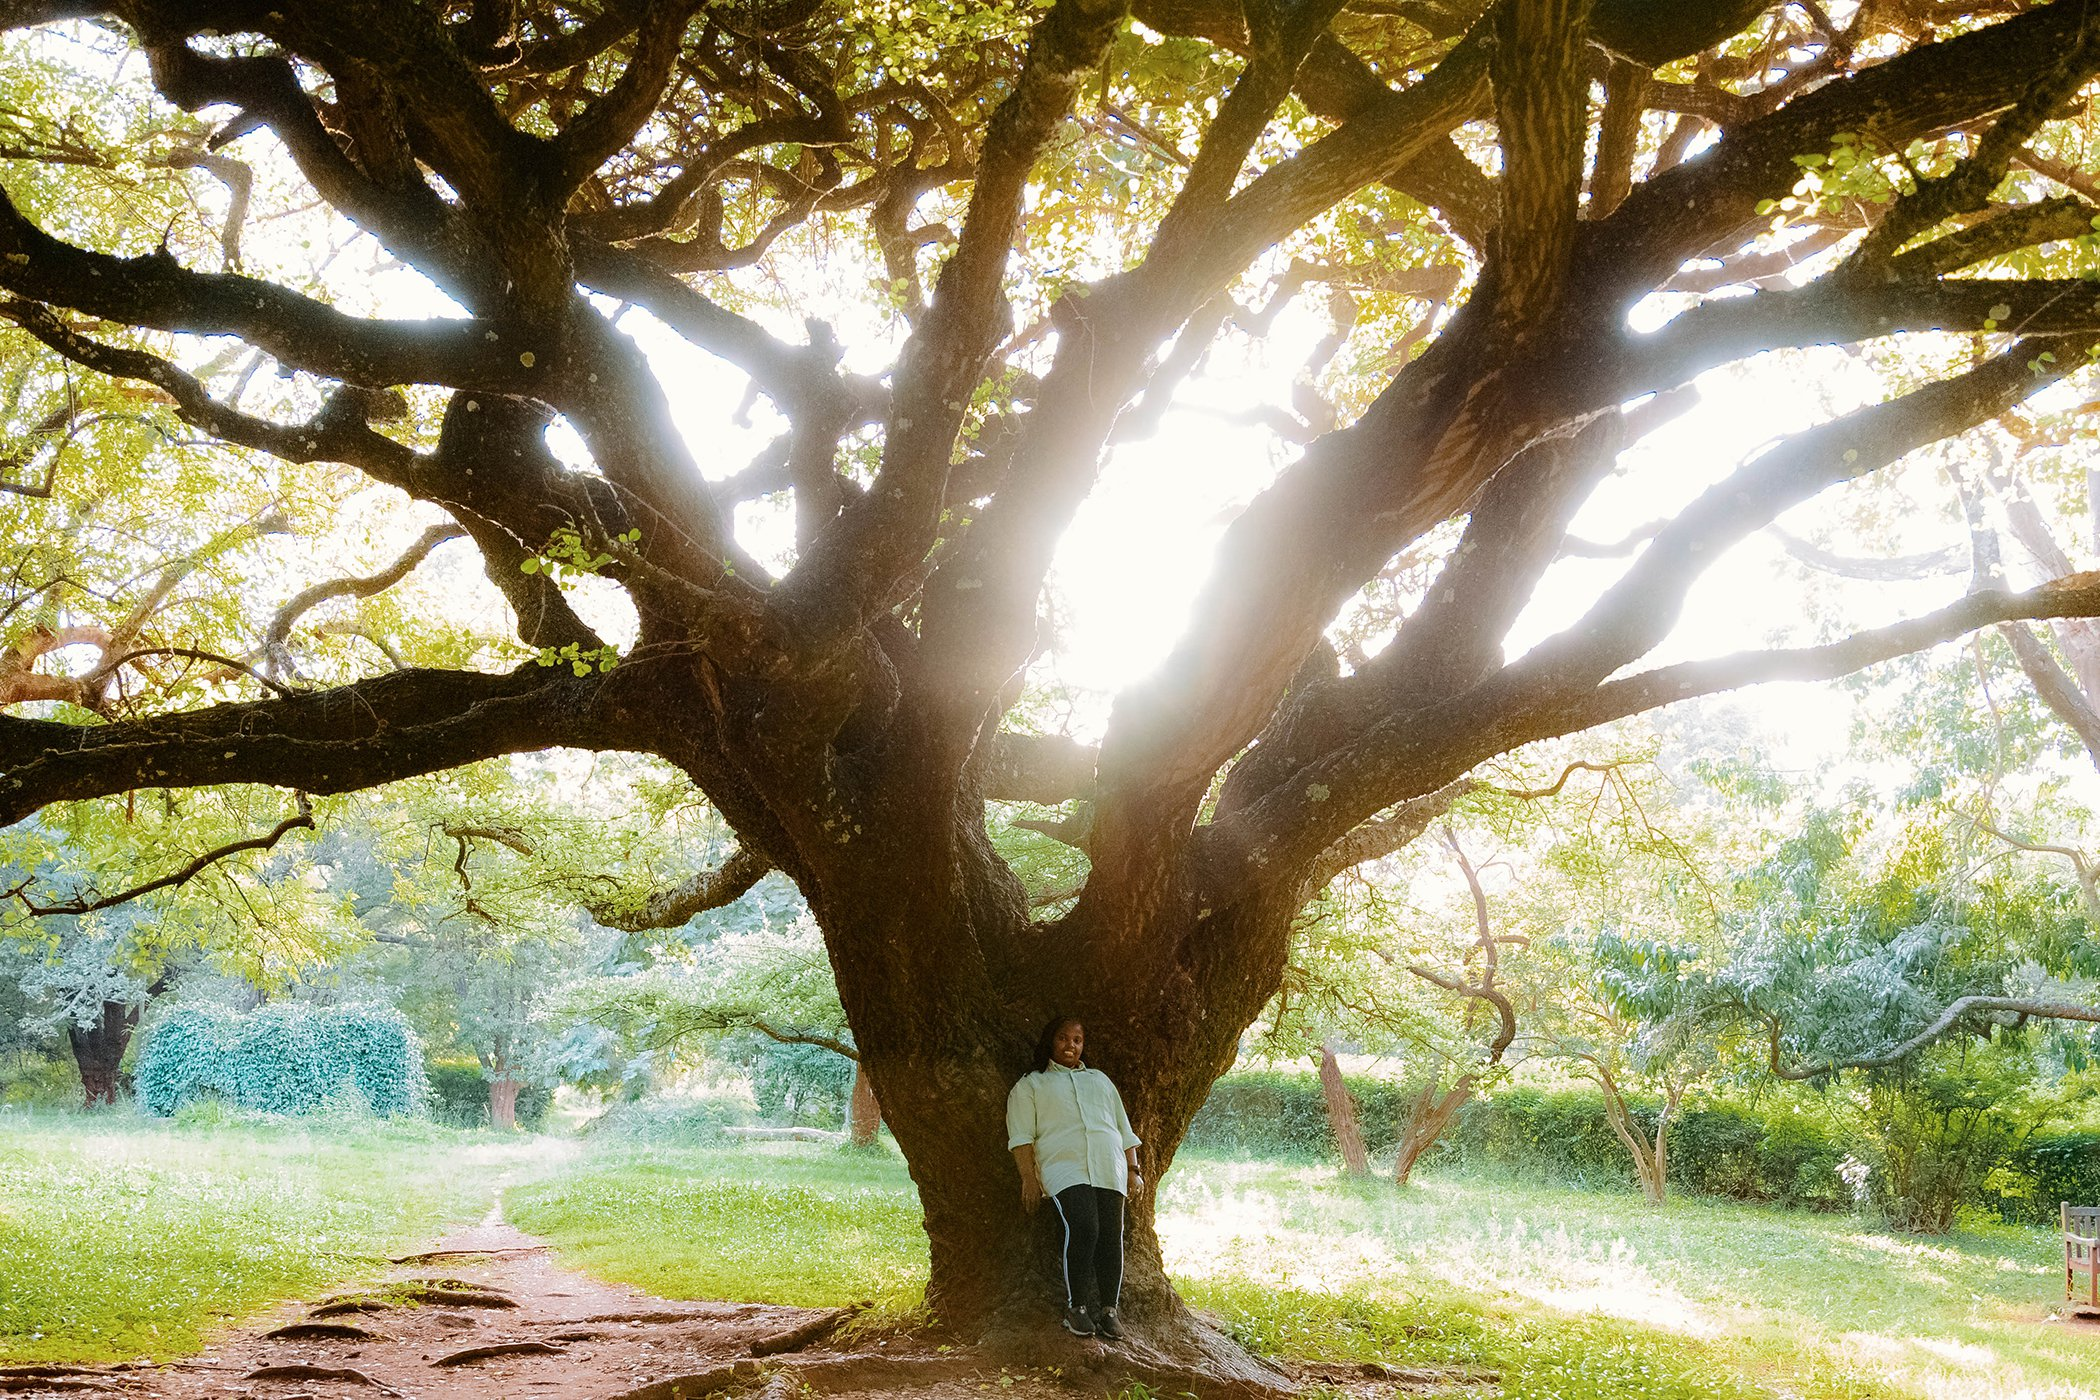 IMOW_WinnieCheche_RootsofAfrikaForGlobalCitizen_023.jpg